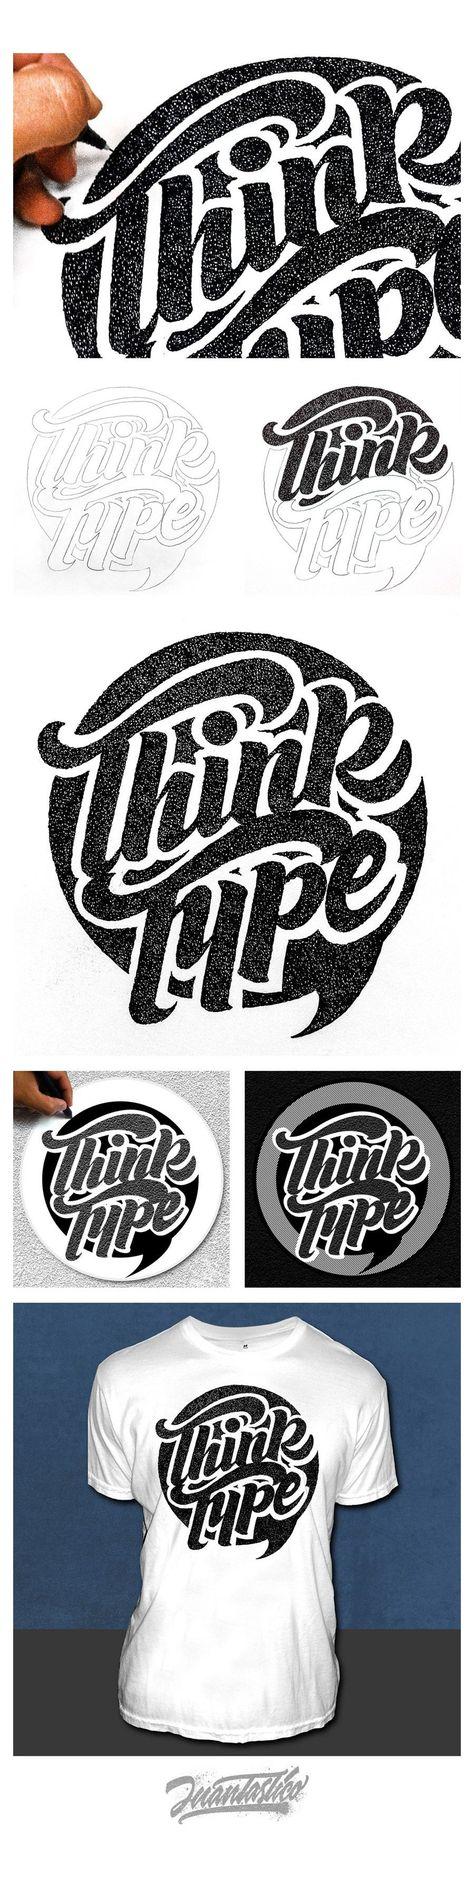 t-shirt design typography illustrations